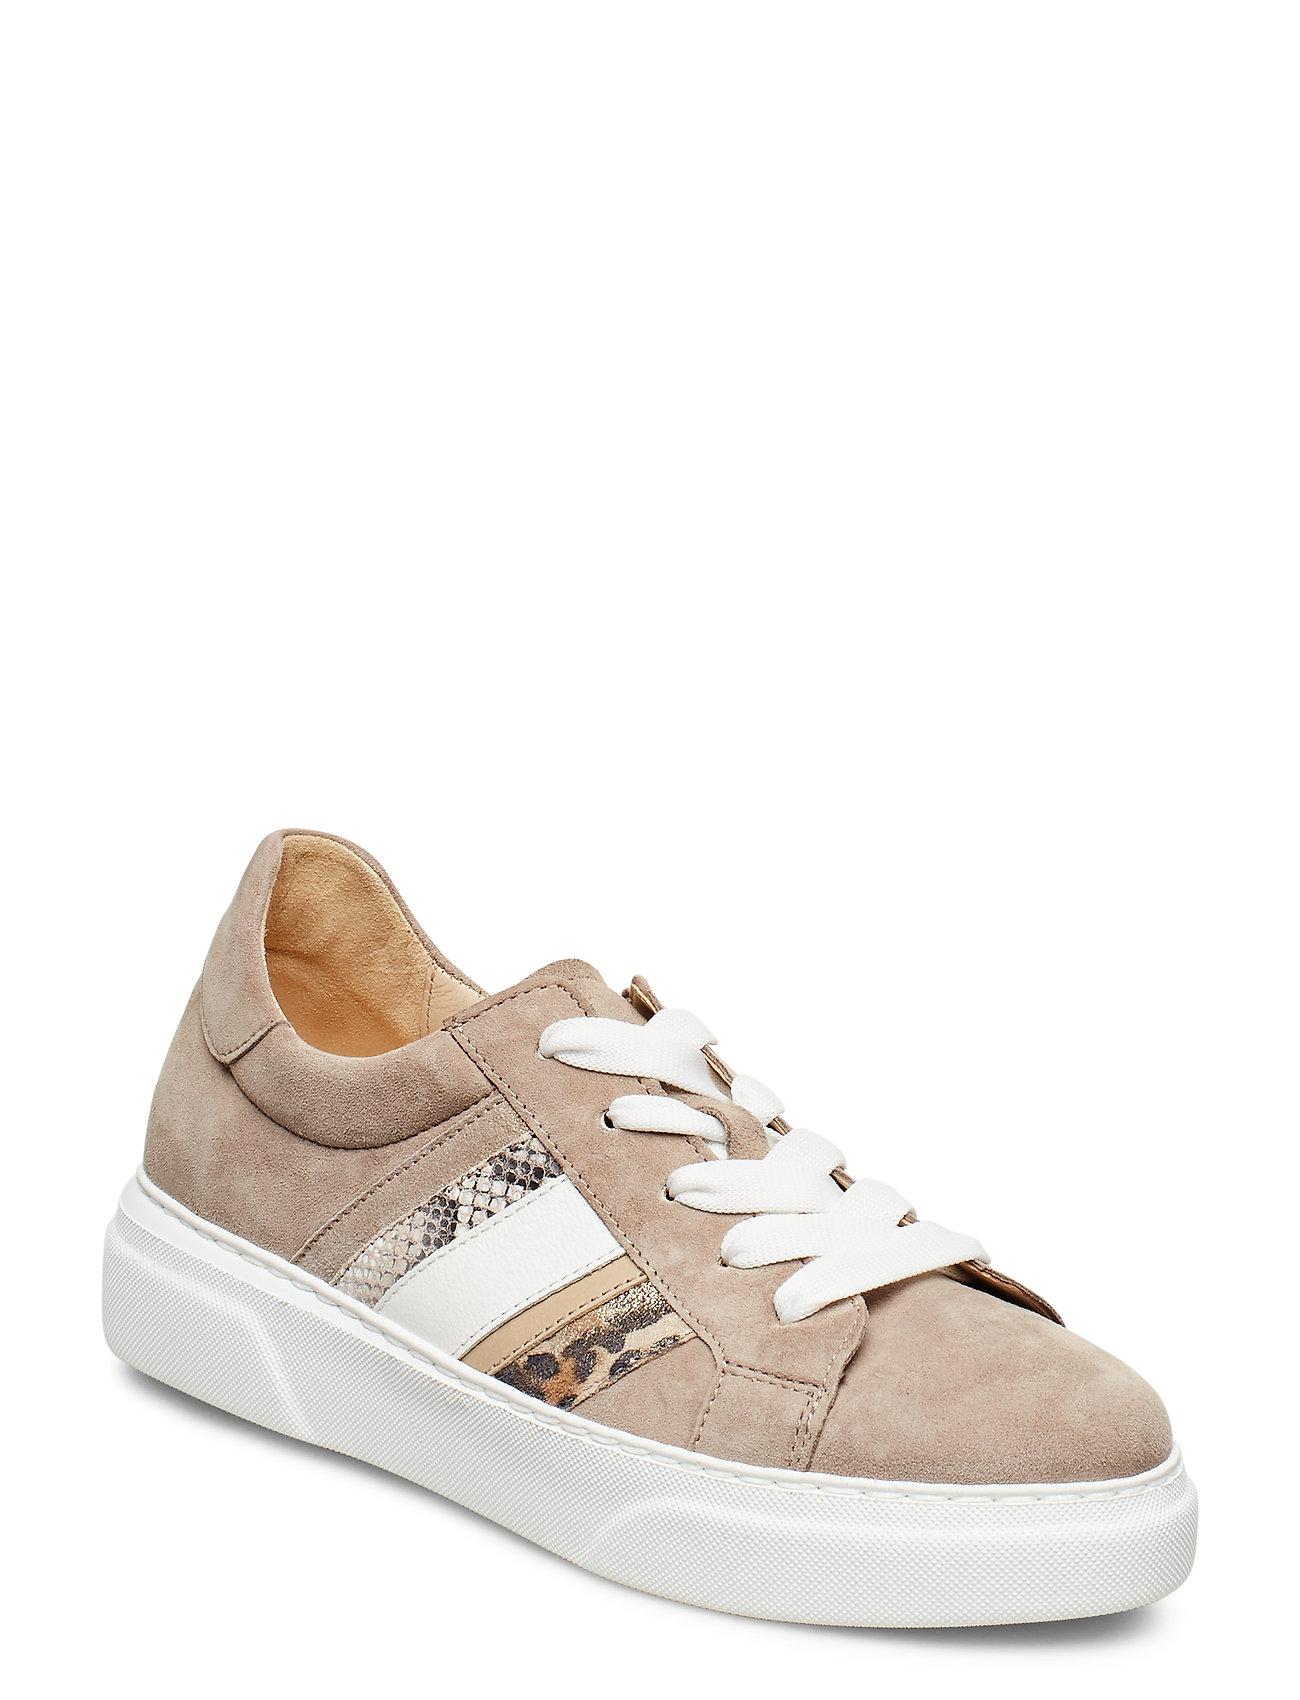 Image of Sneaker Low-top Sneakers Beige Gabor (3373405977)